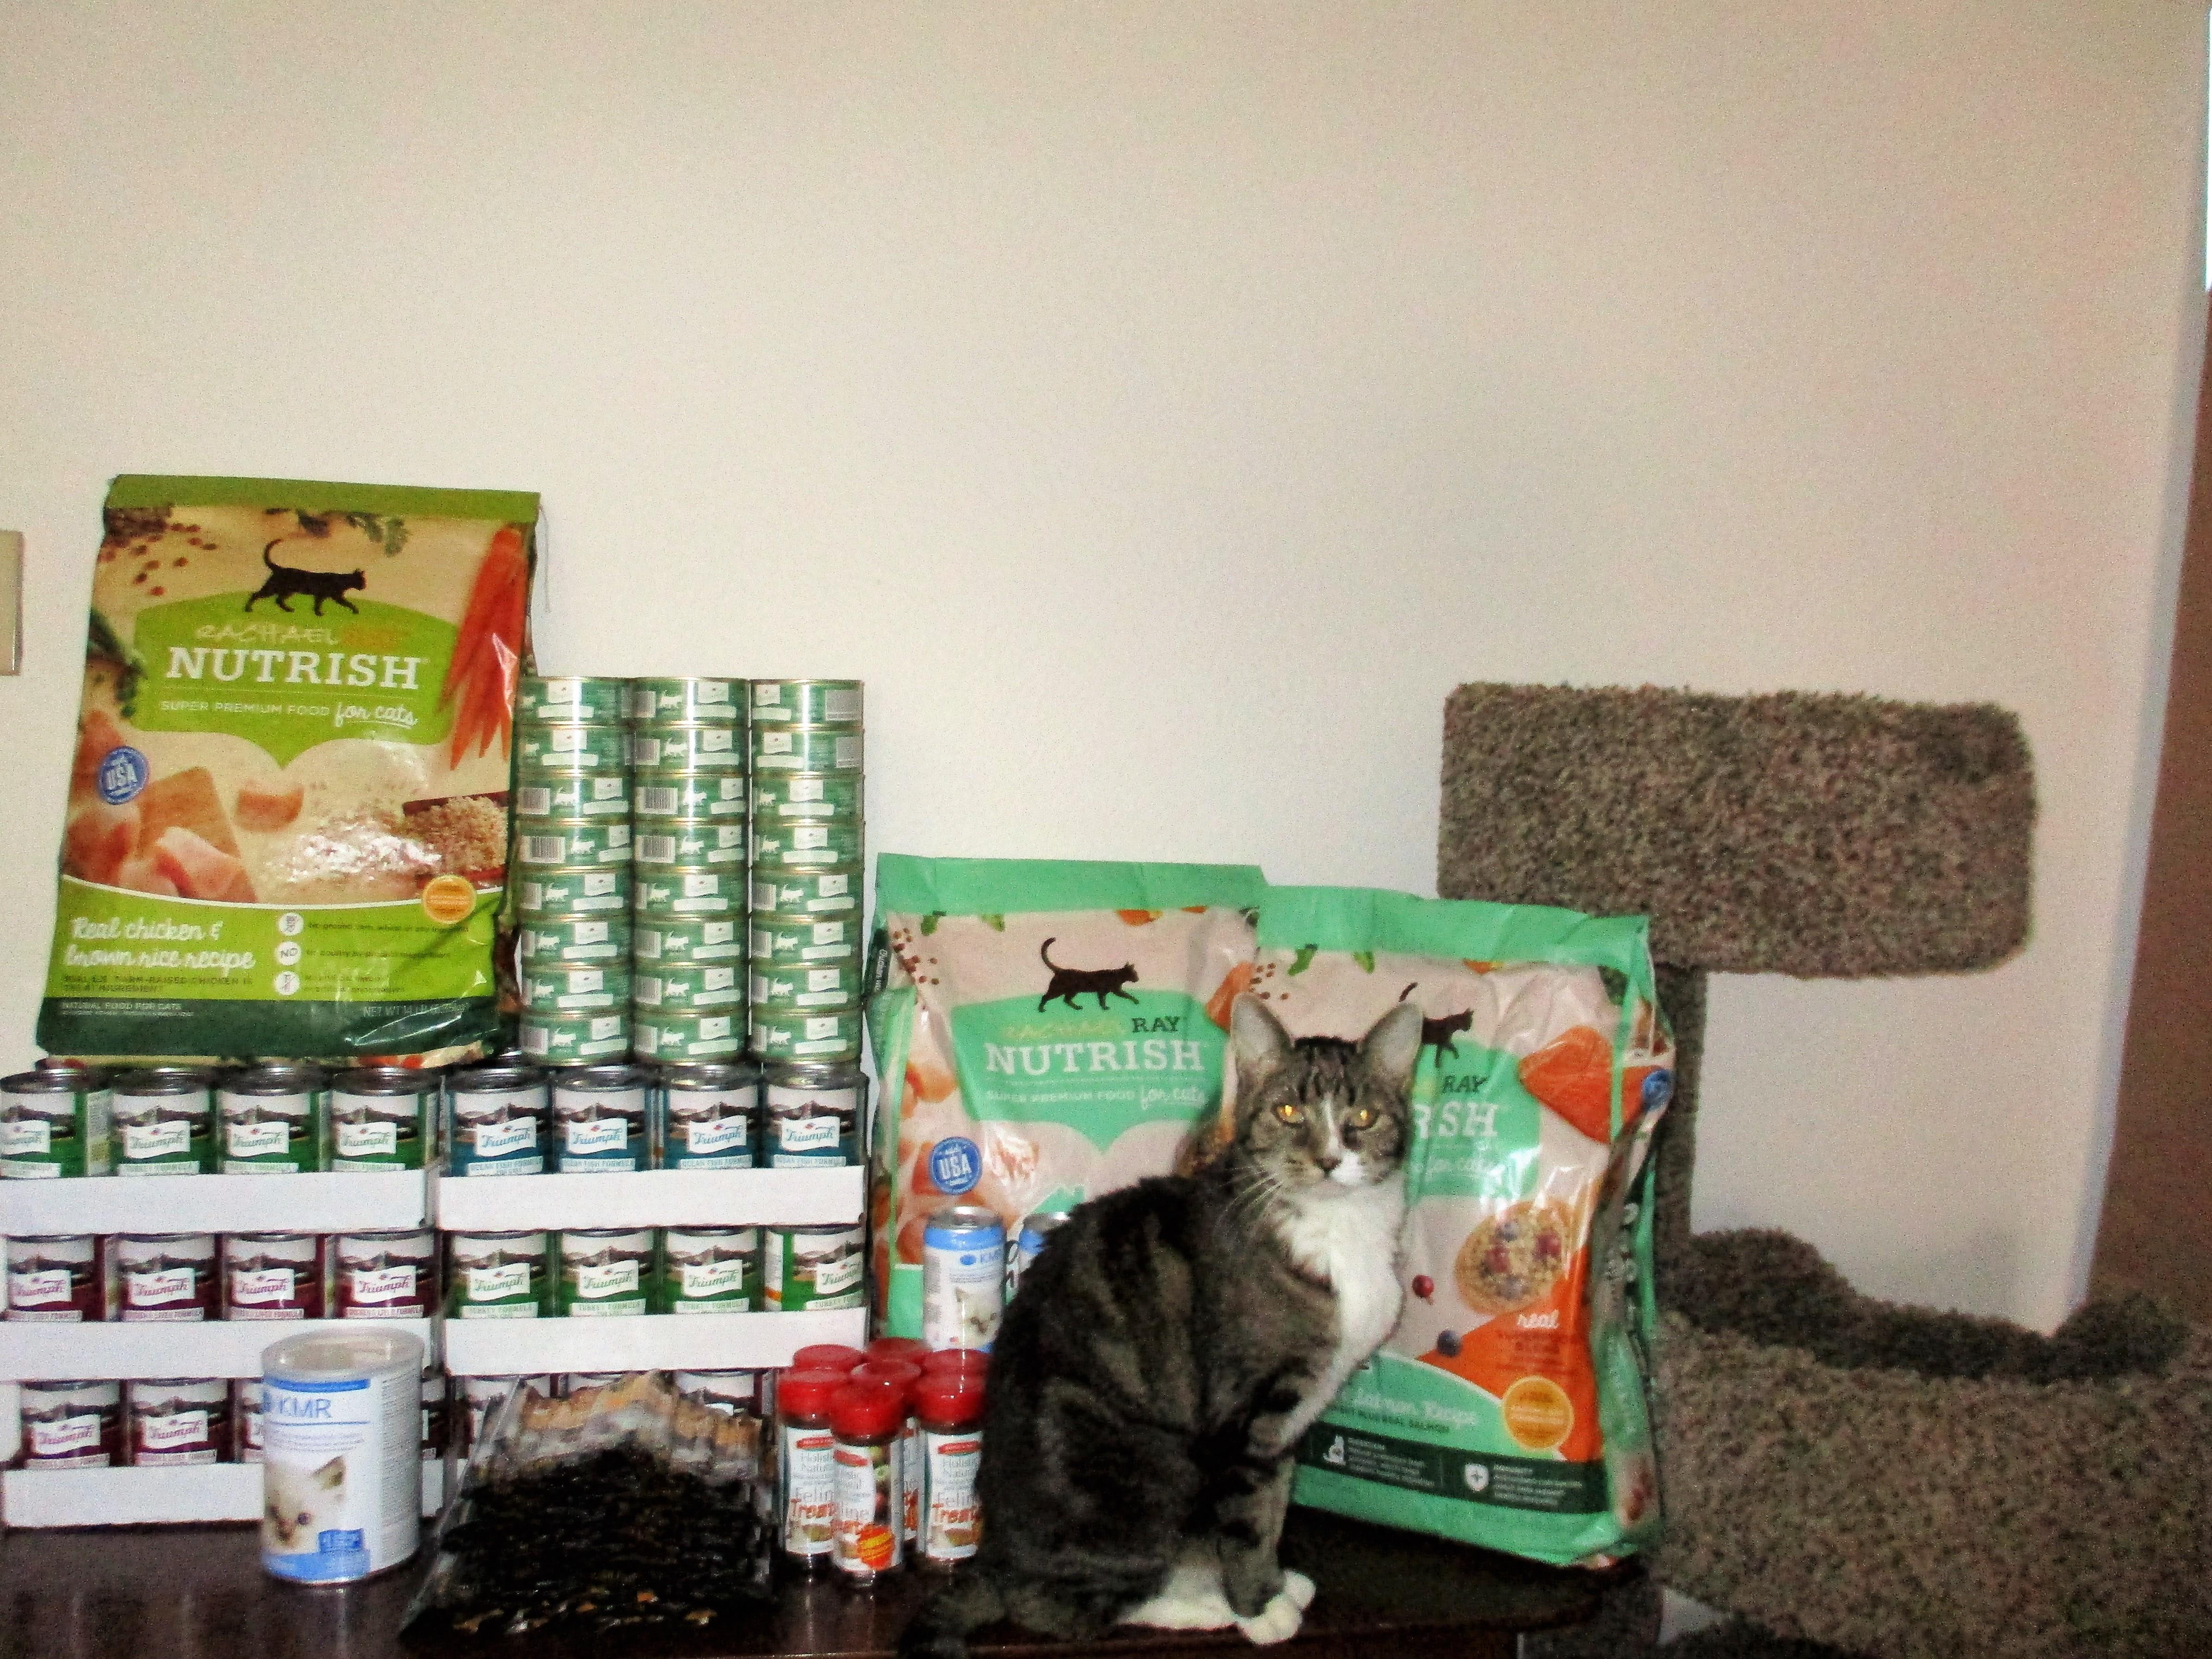 Our Senior Catizen takes inventory!